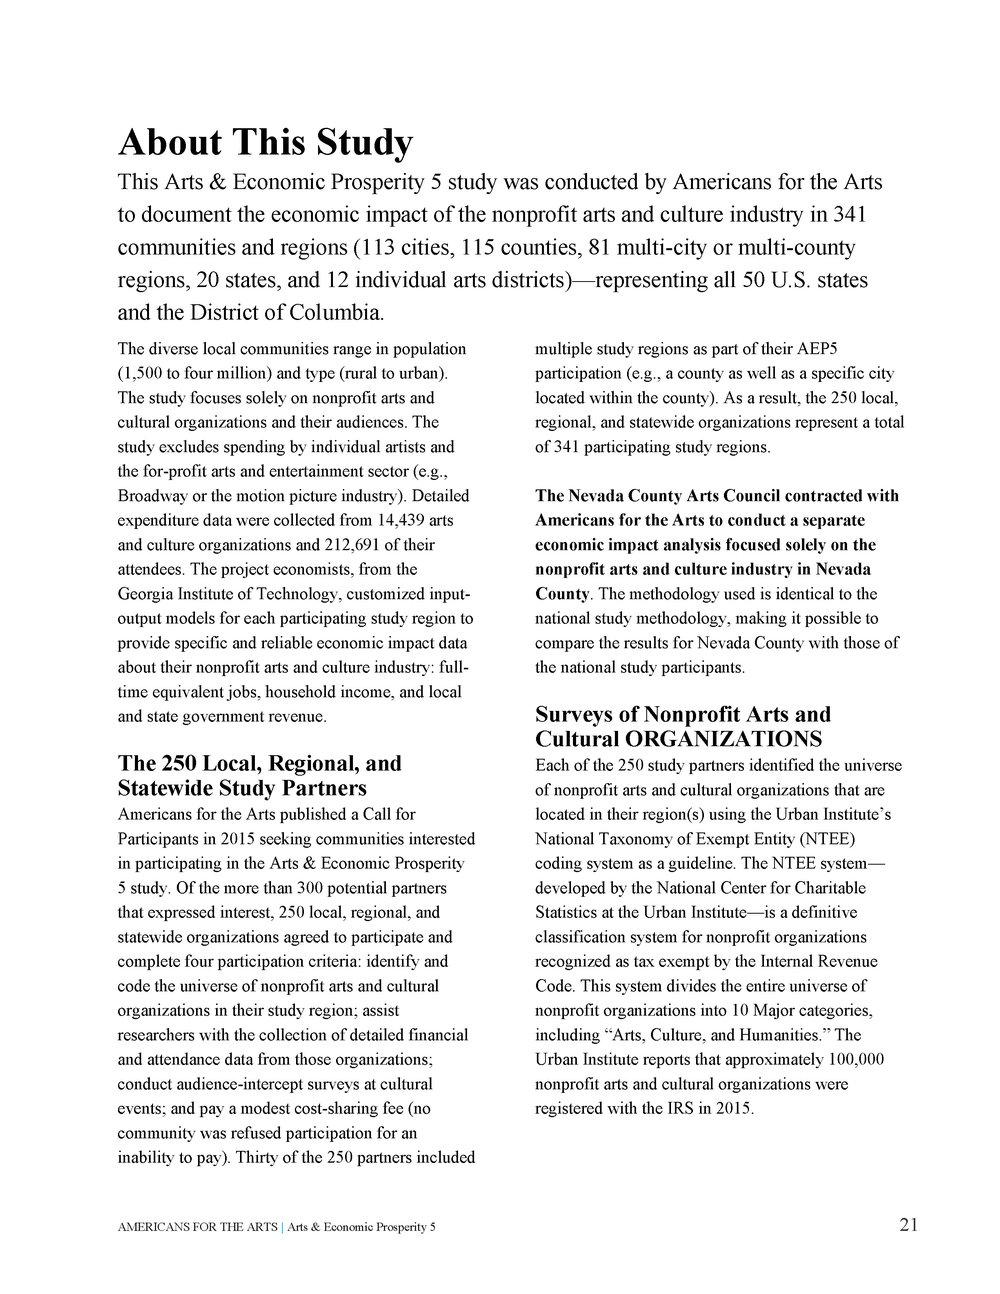 Arts & Economic Prosperity in Nevada County_Page_25.jpg